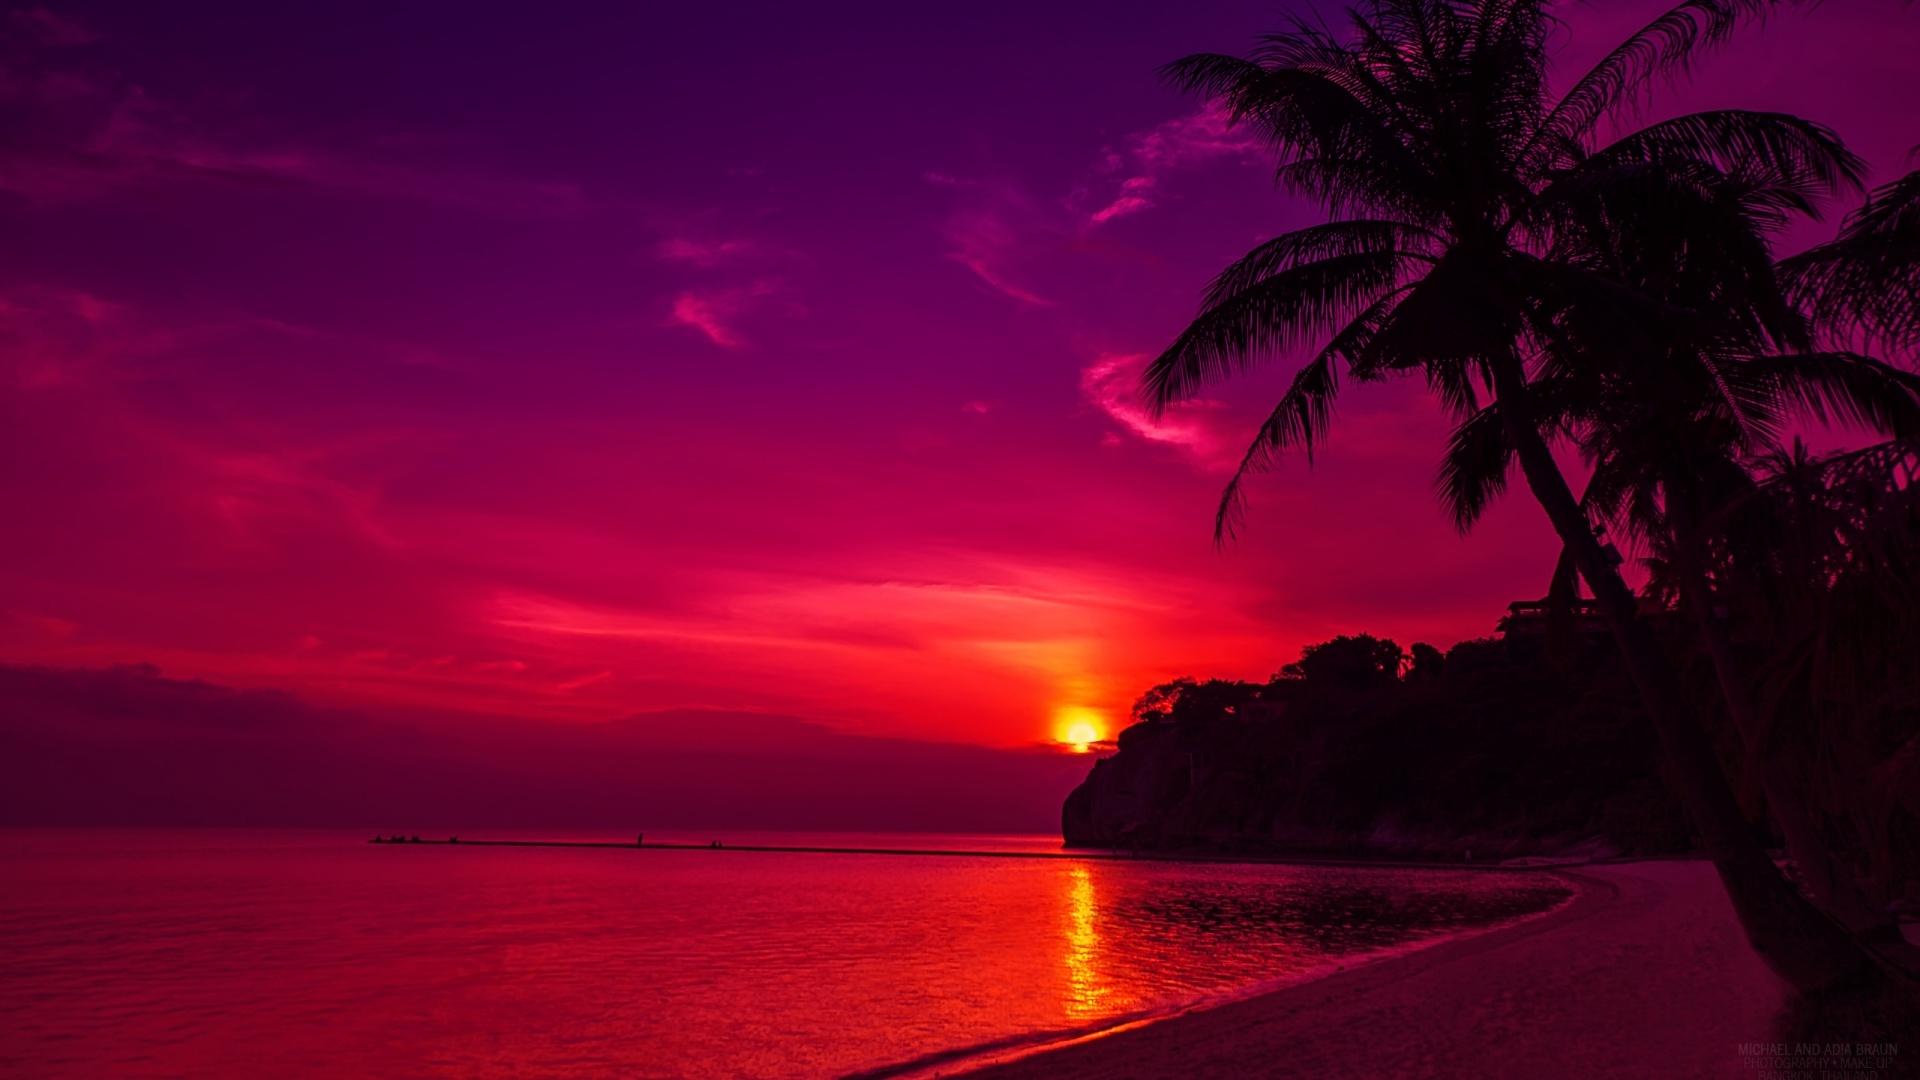 Thailand Beach Sunset Wallpapers HD Wallpapers 1920x1080